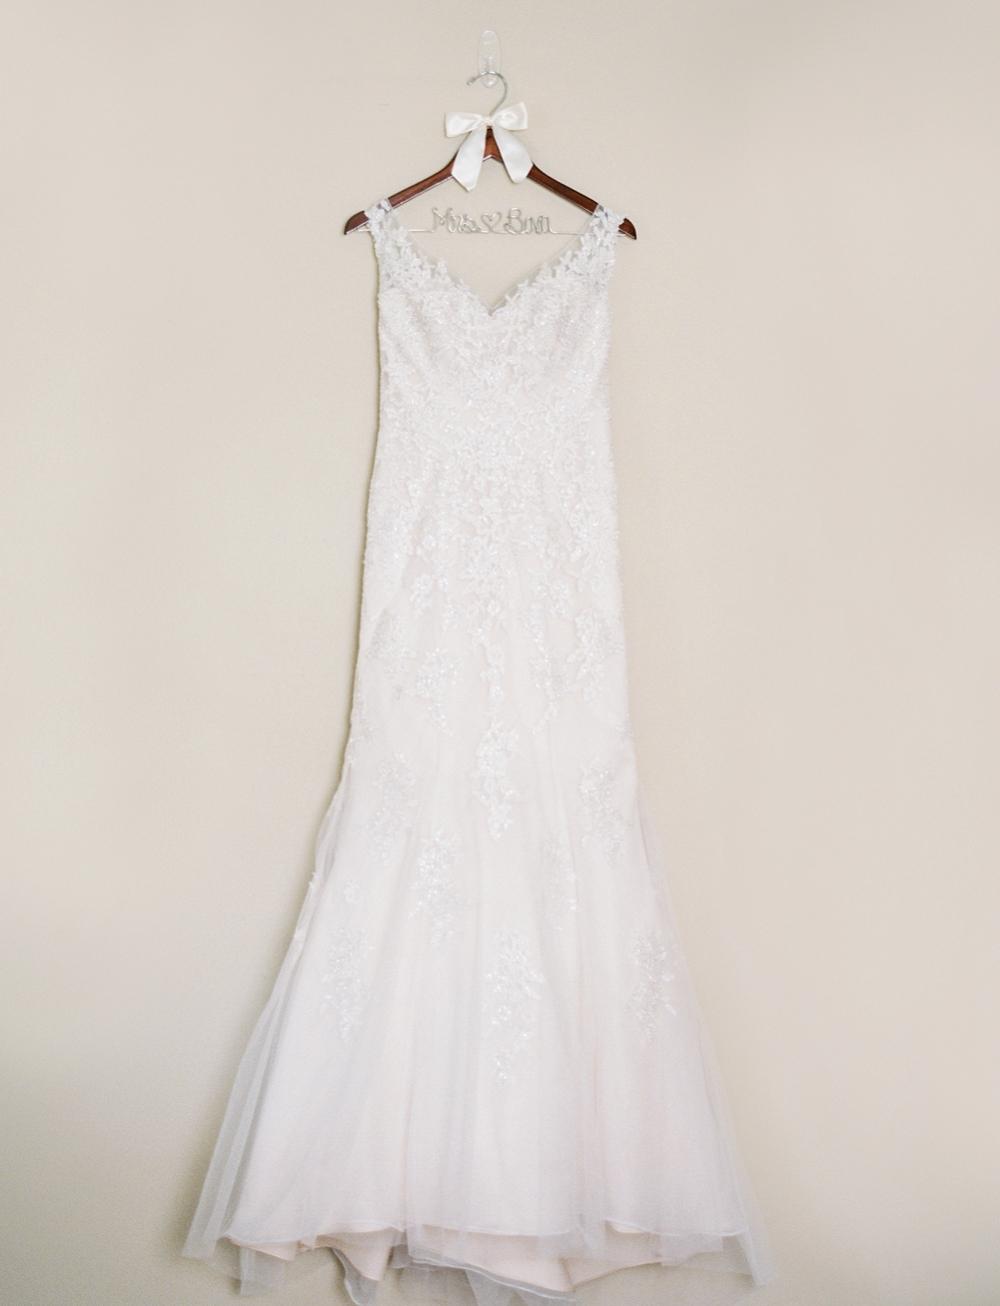 Vicki+Grafton+Photography+-+Fine+Art+Film+Wedding+Photographer+-+Bella+Collina+Wedding_0008.jpg